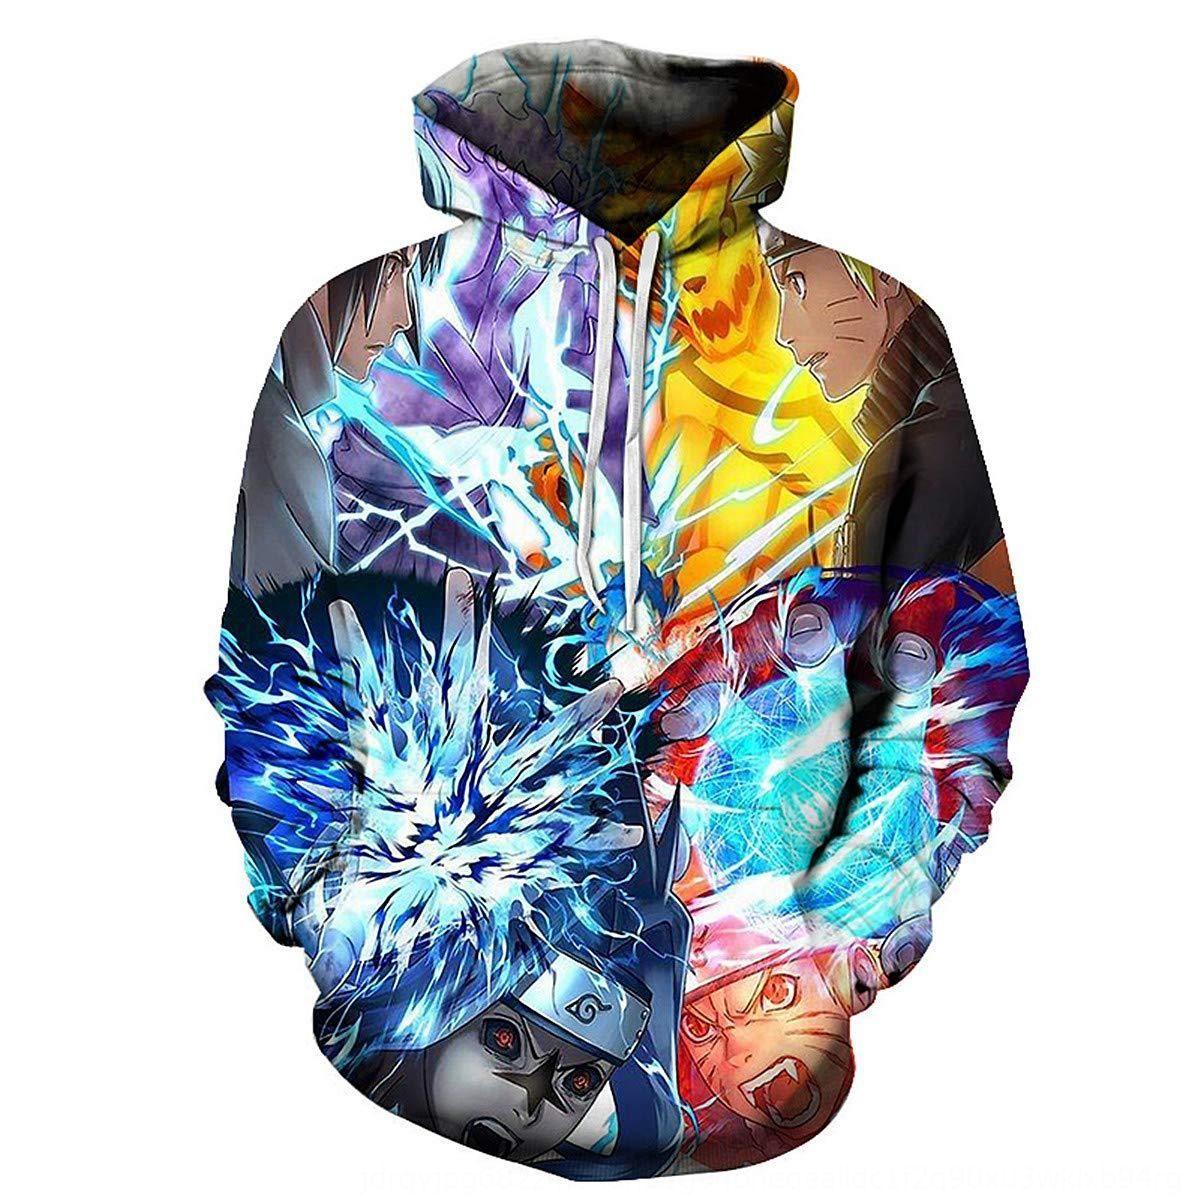 NSf0y Overseas Narutos Männer gedruckt Sweatshirt 3D Pullover Pullover Kapuzen-Sweatshirt mit Kängurutasche